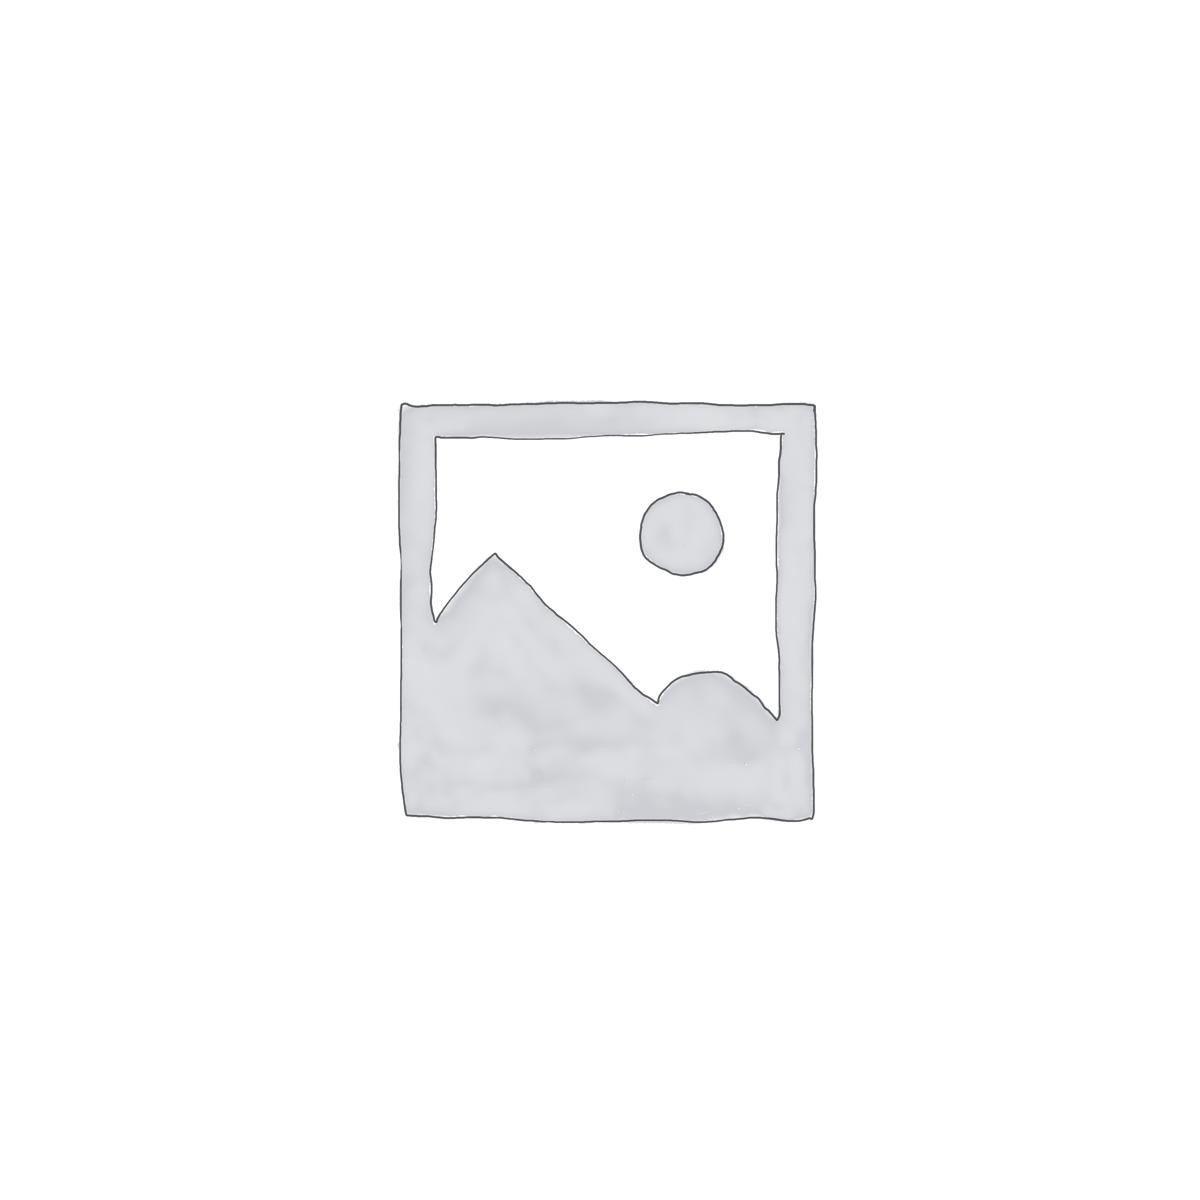 Vintage World Map Wallpaper Mural